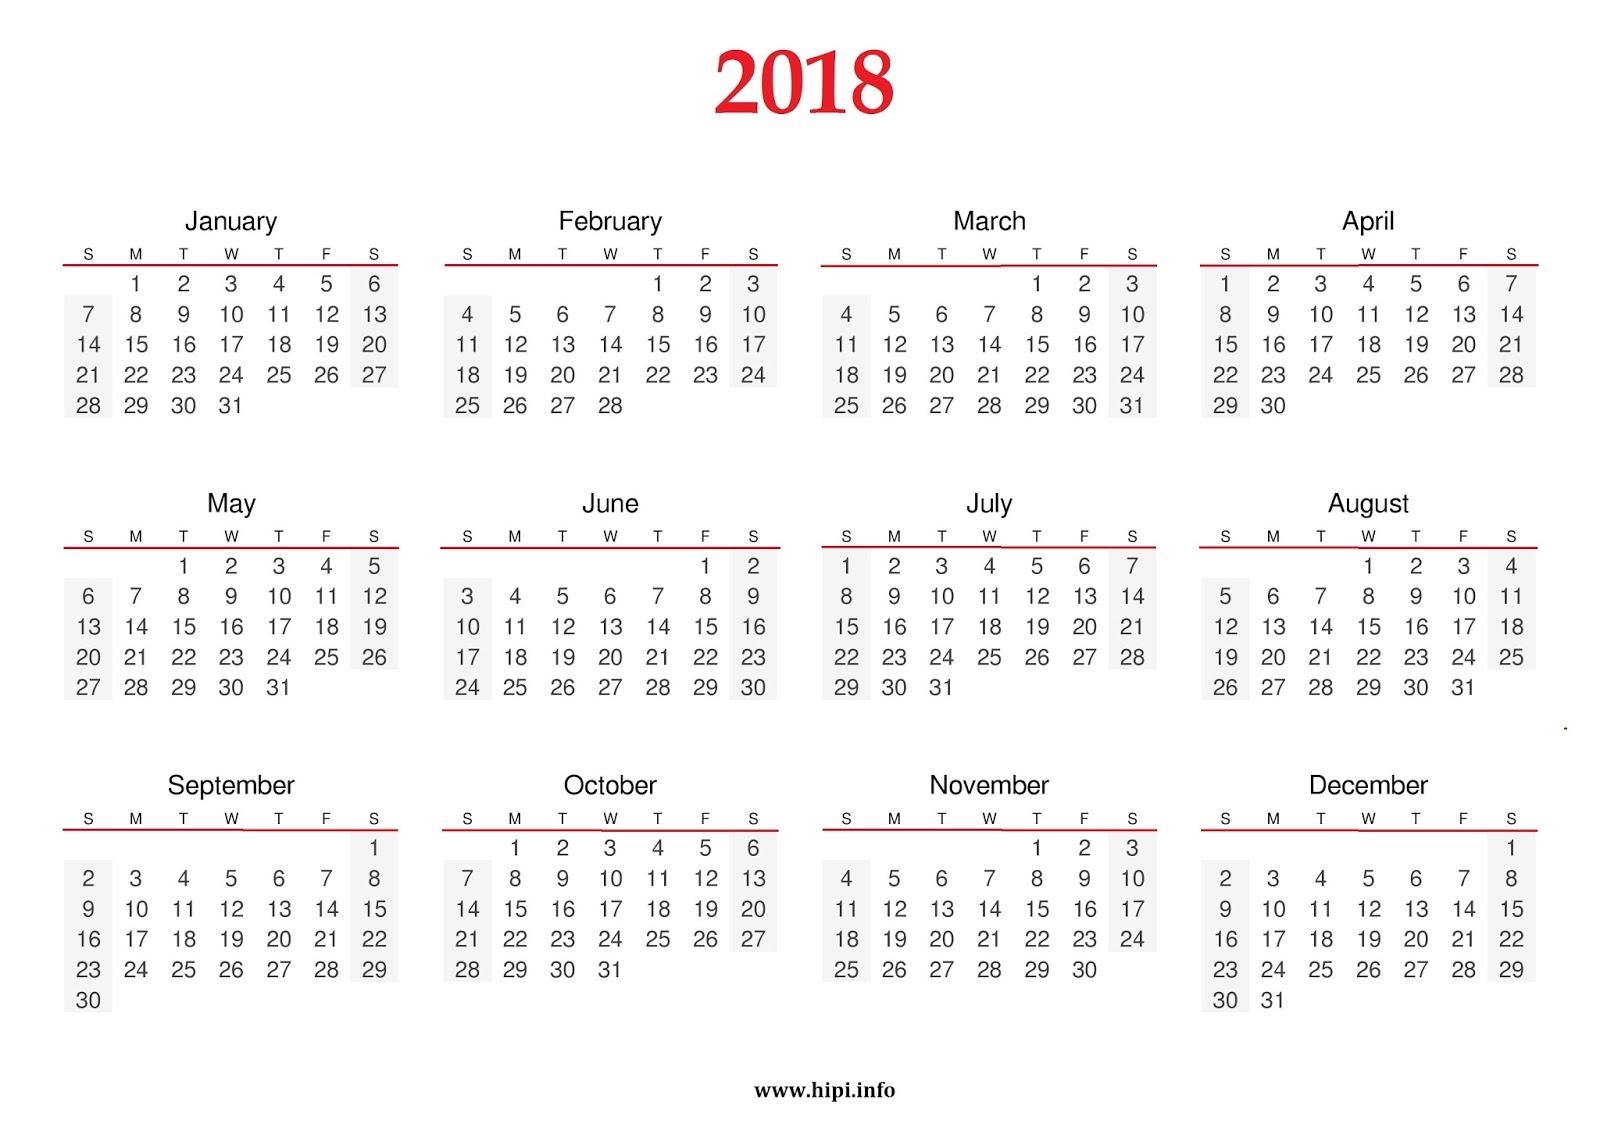 download 2018 calendar